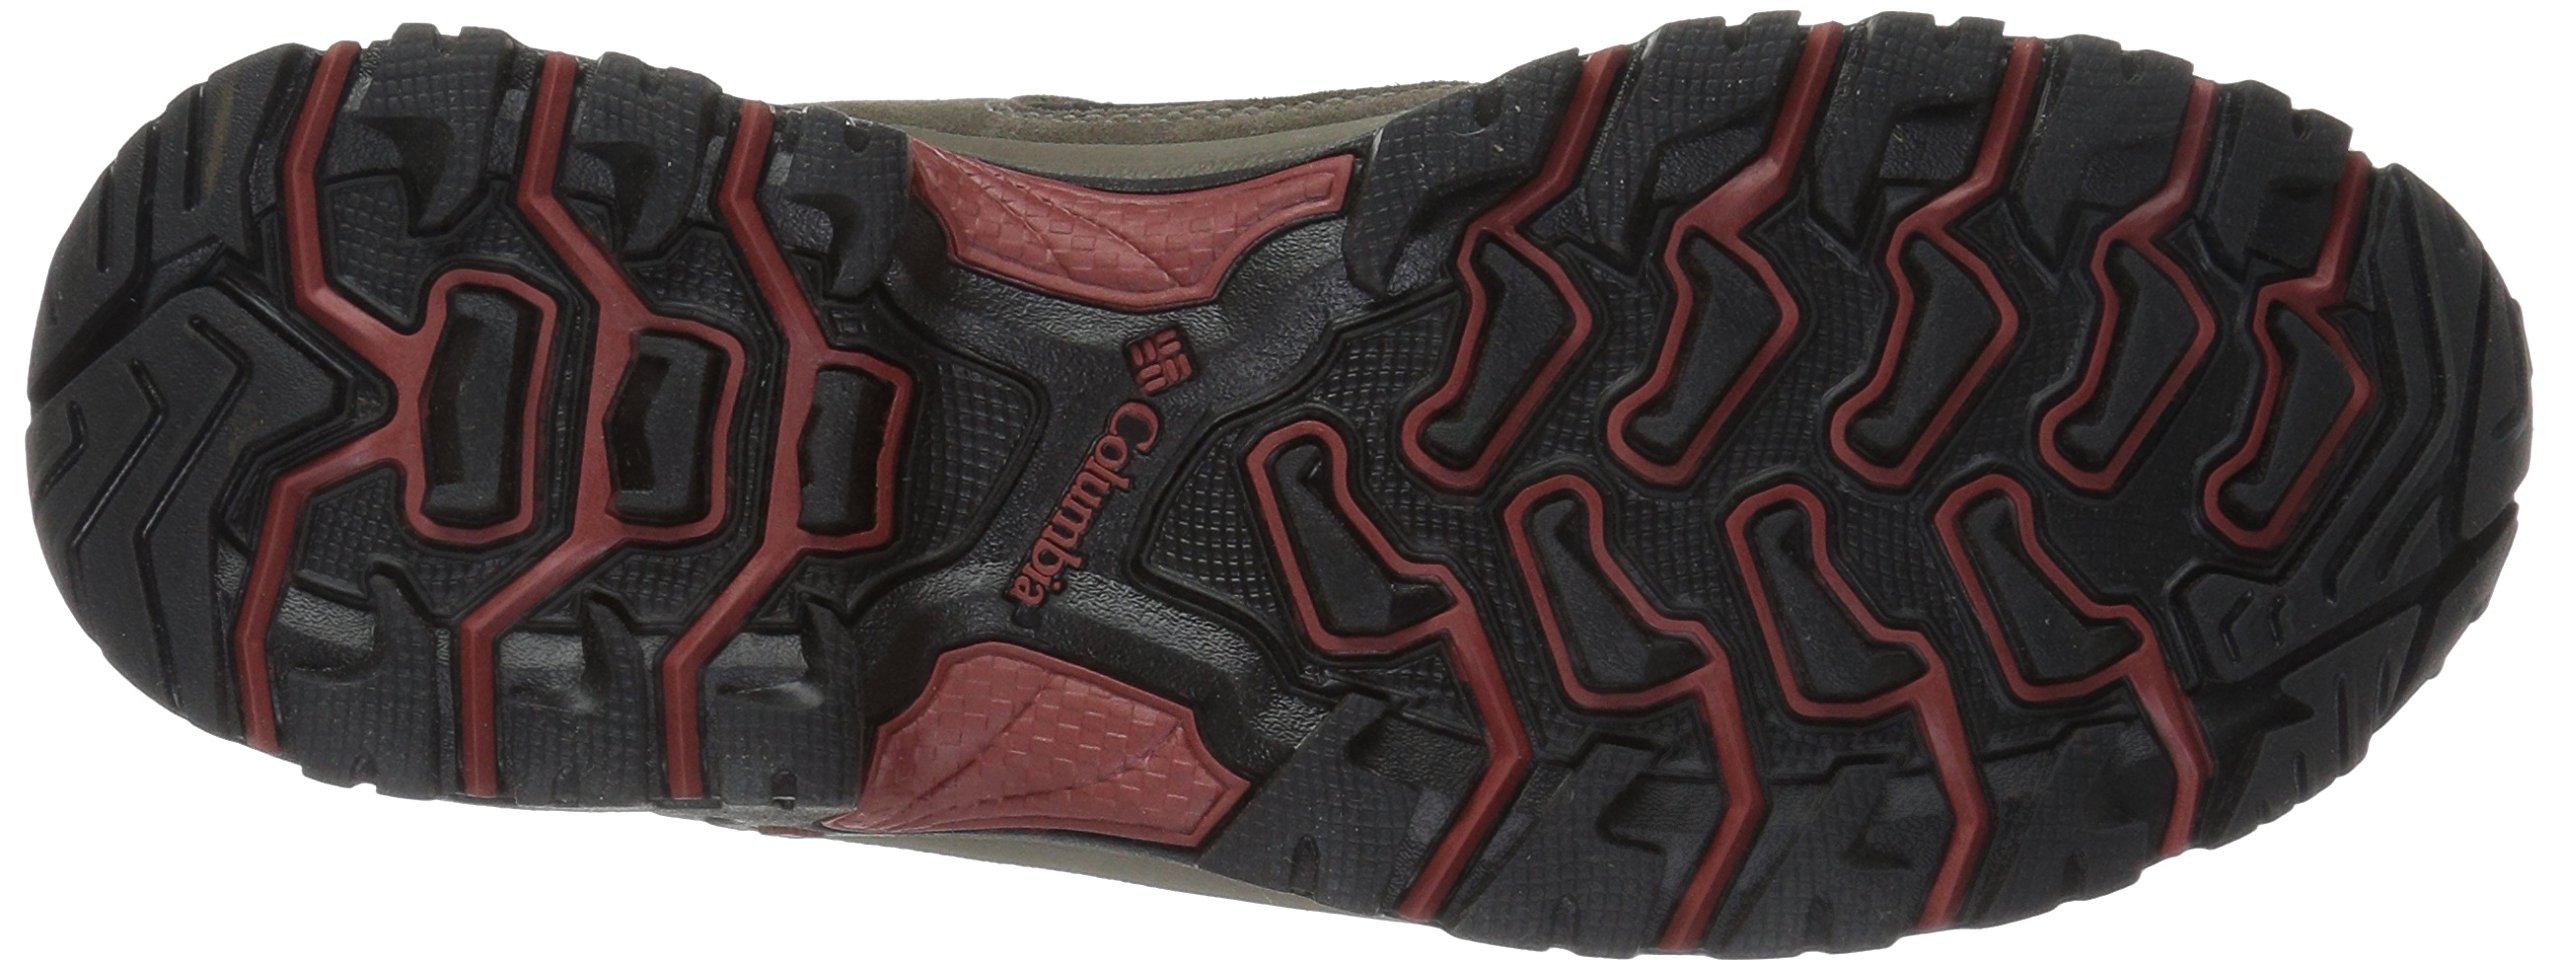 923a94708b Columbia Men s GRANITE RIDGE WATERPROOF WIDE Hiking Shoe   Hiking Shoes    Clothing